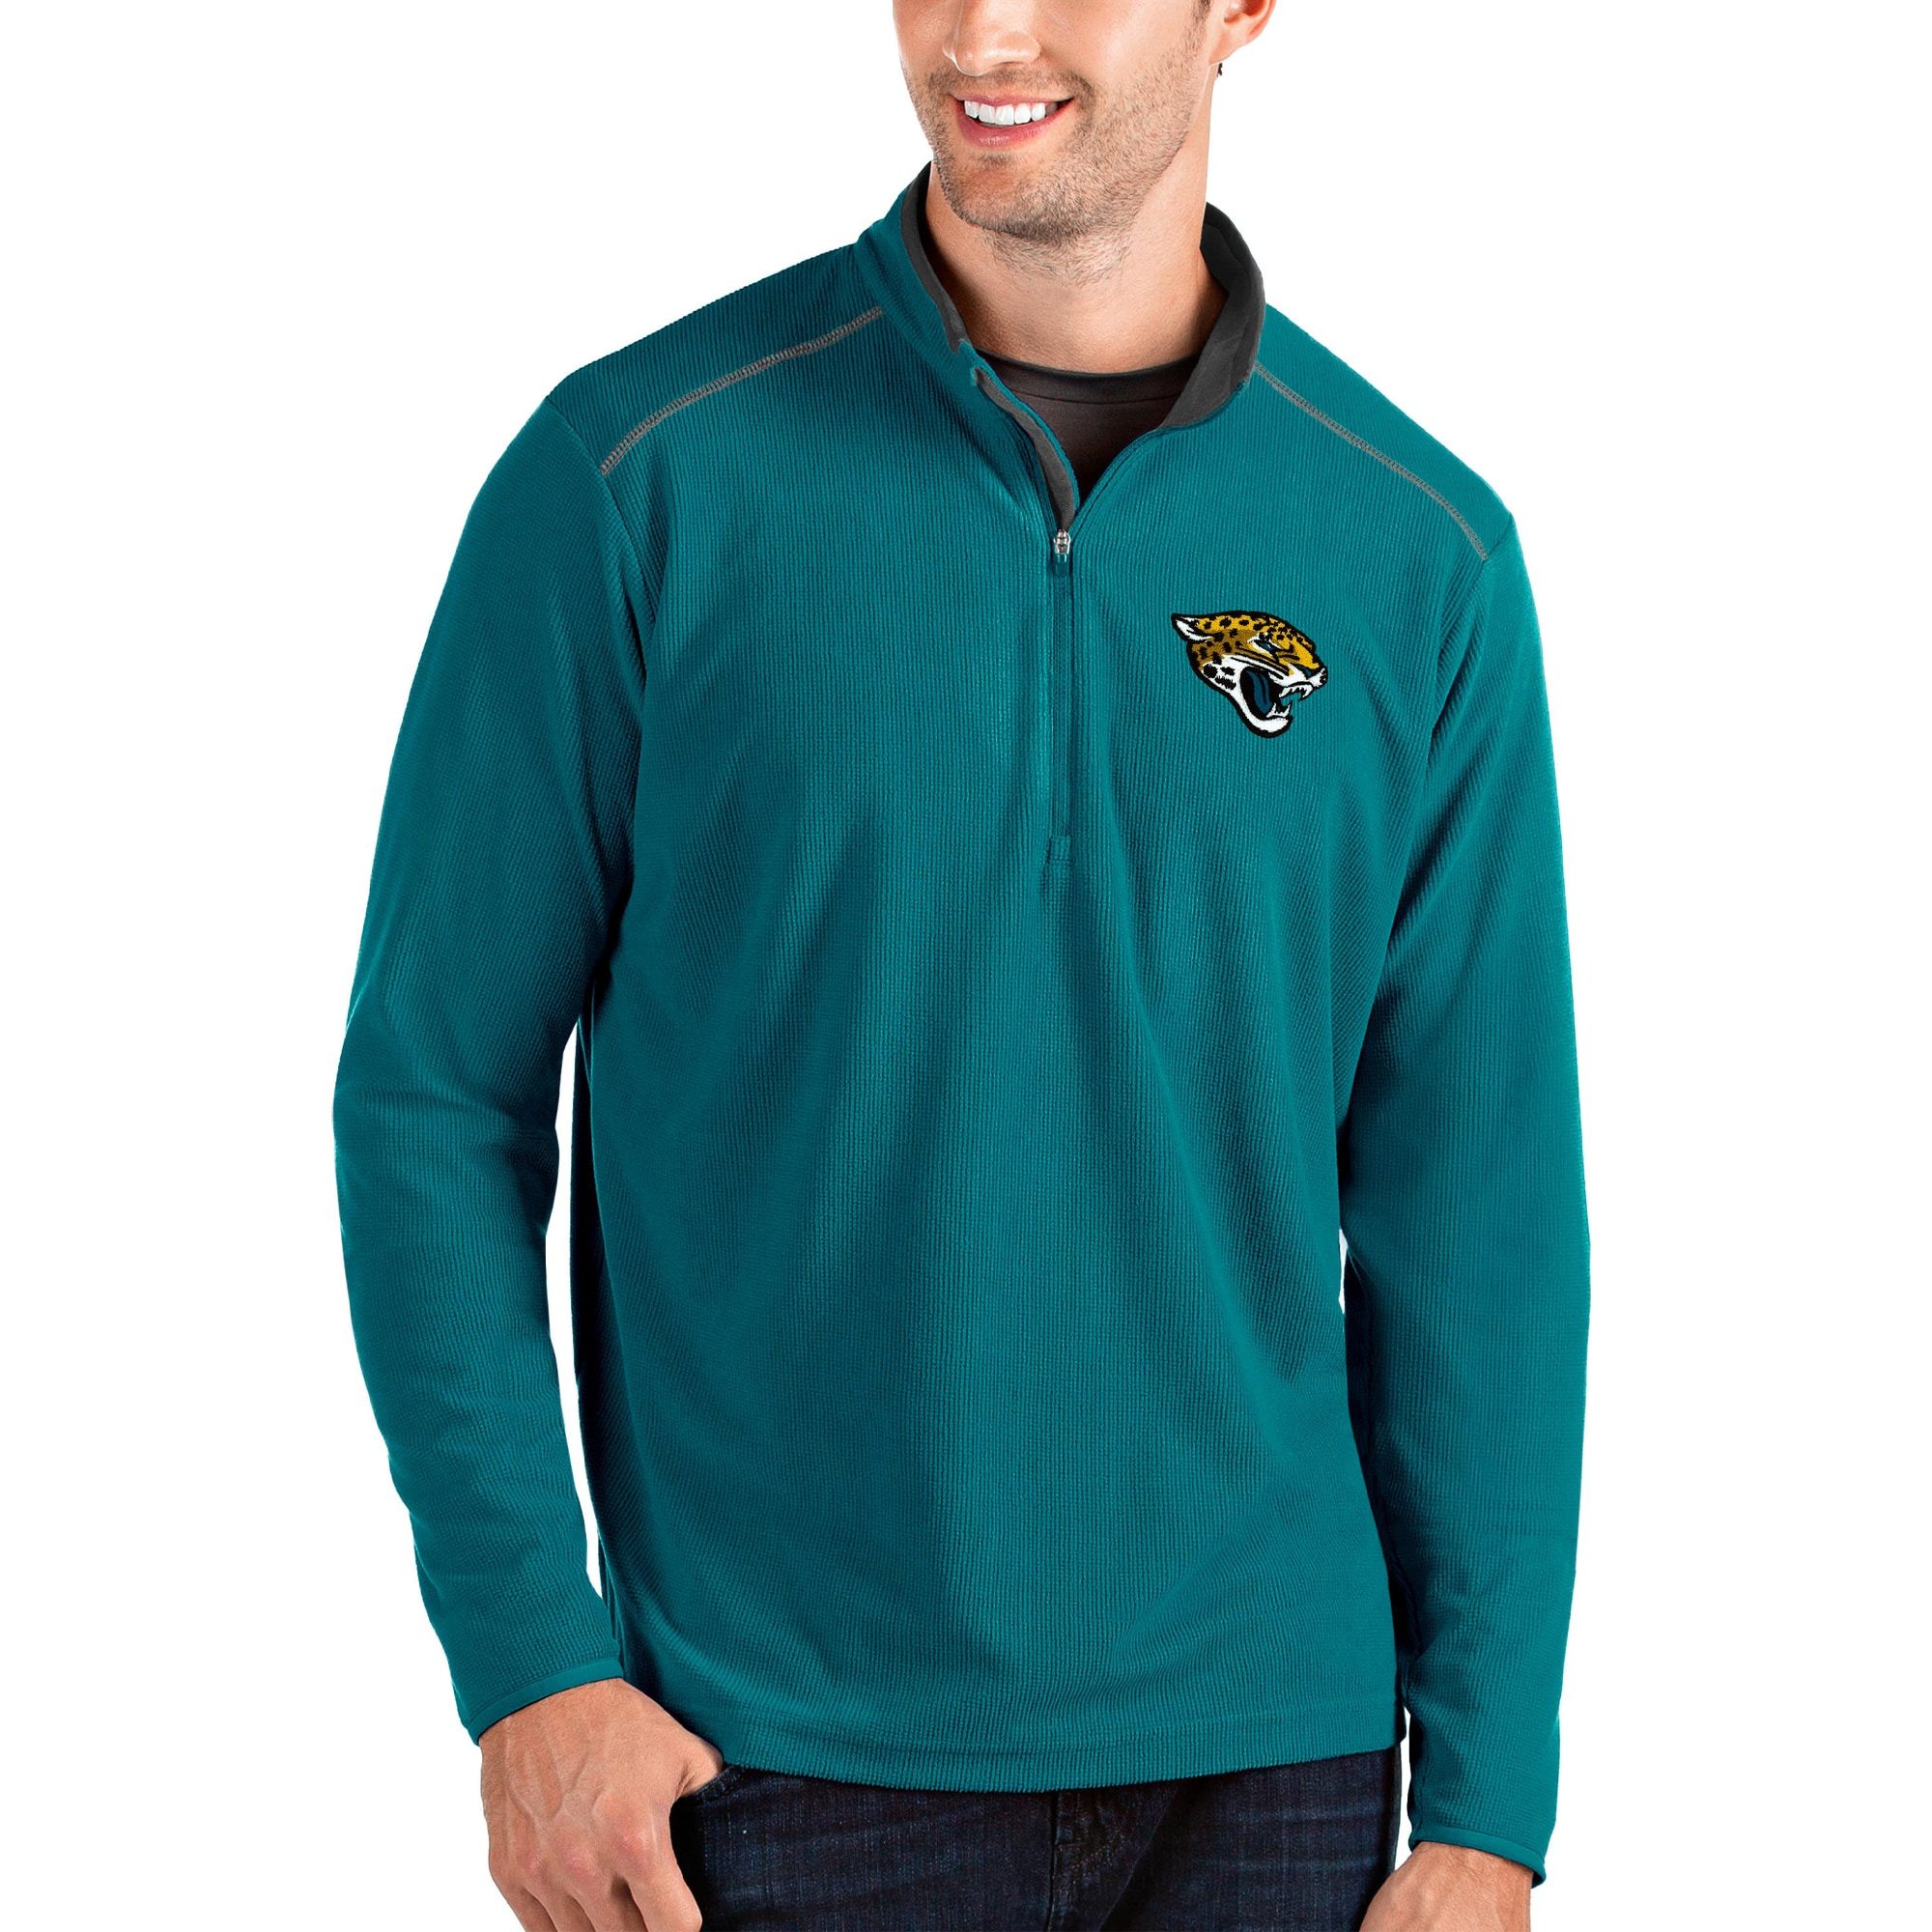 Jacksonville Jaguars Antigua Glacier Quarter-Zip Pullover Jacket - Teal/Gray